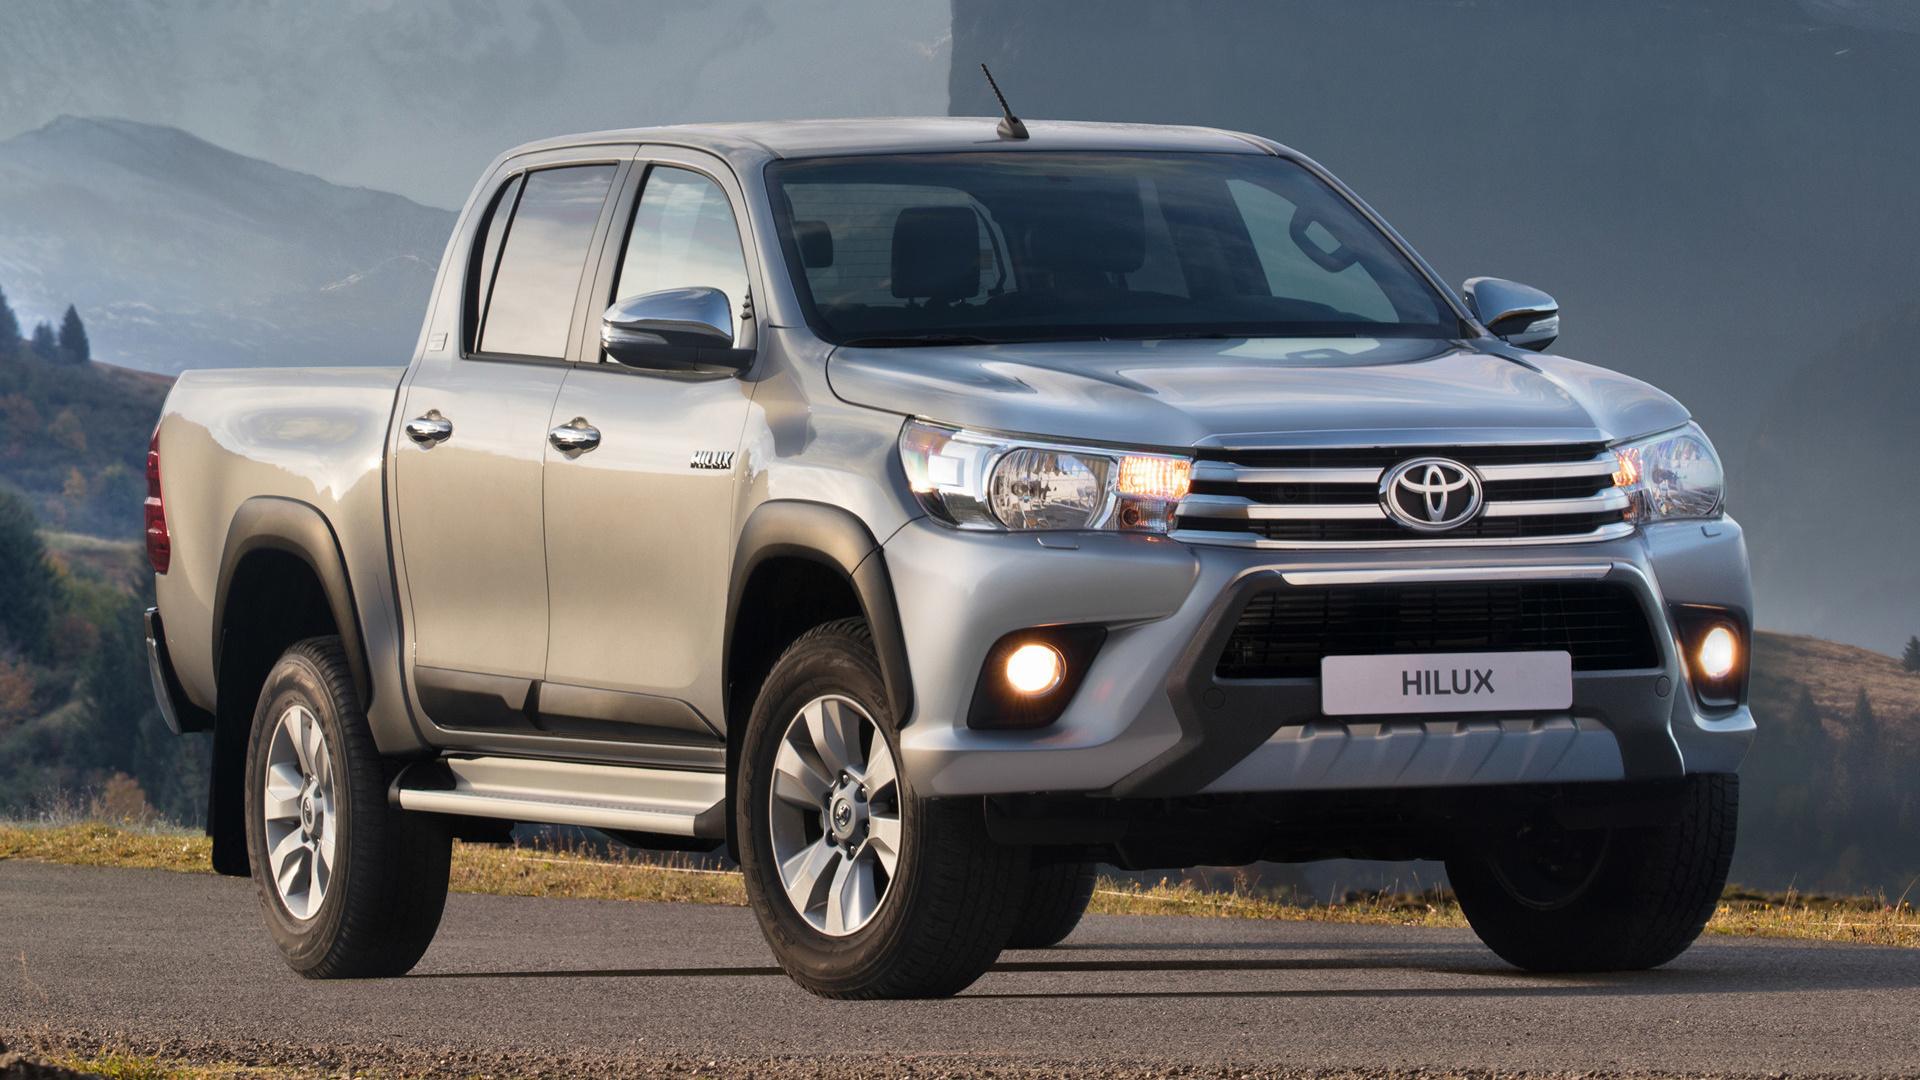 2018 Toyota Hilux Double Cab Legende Sport Wallpapers